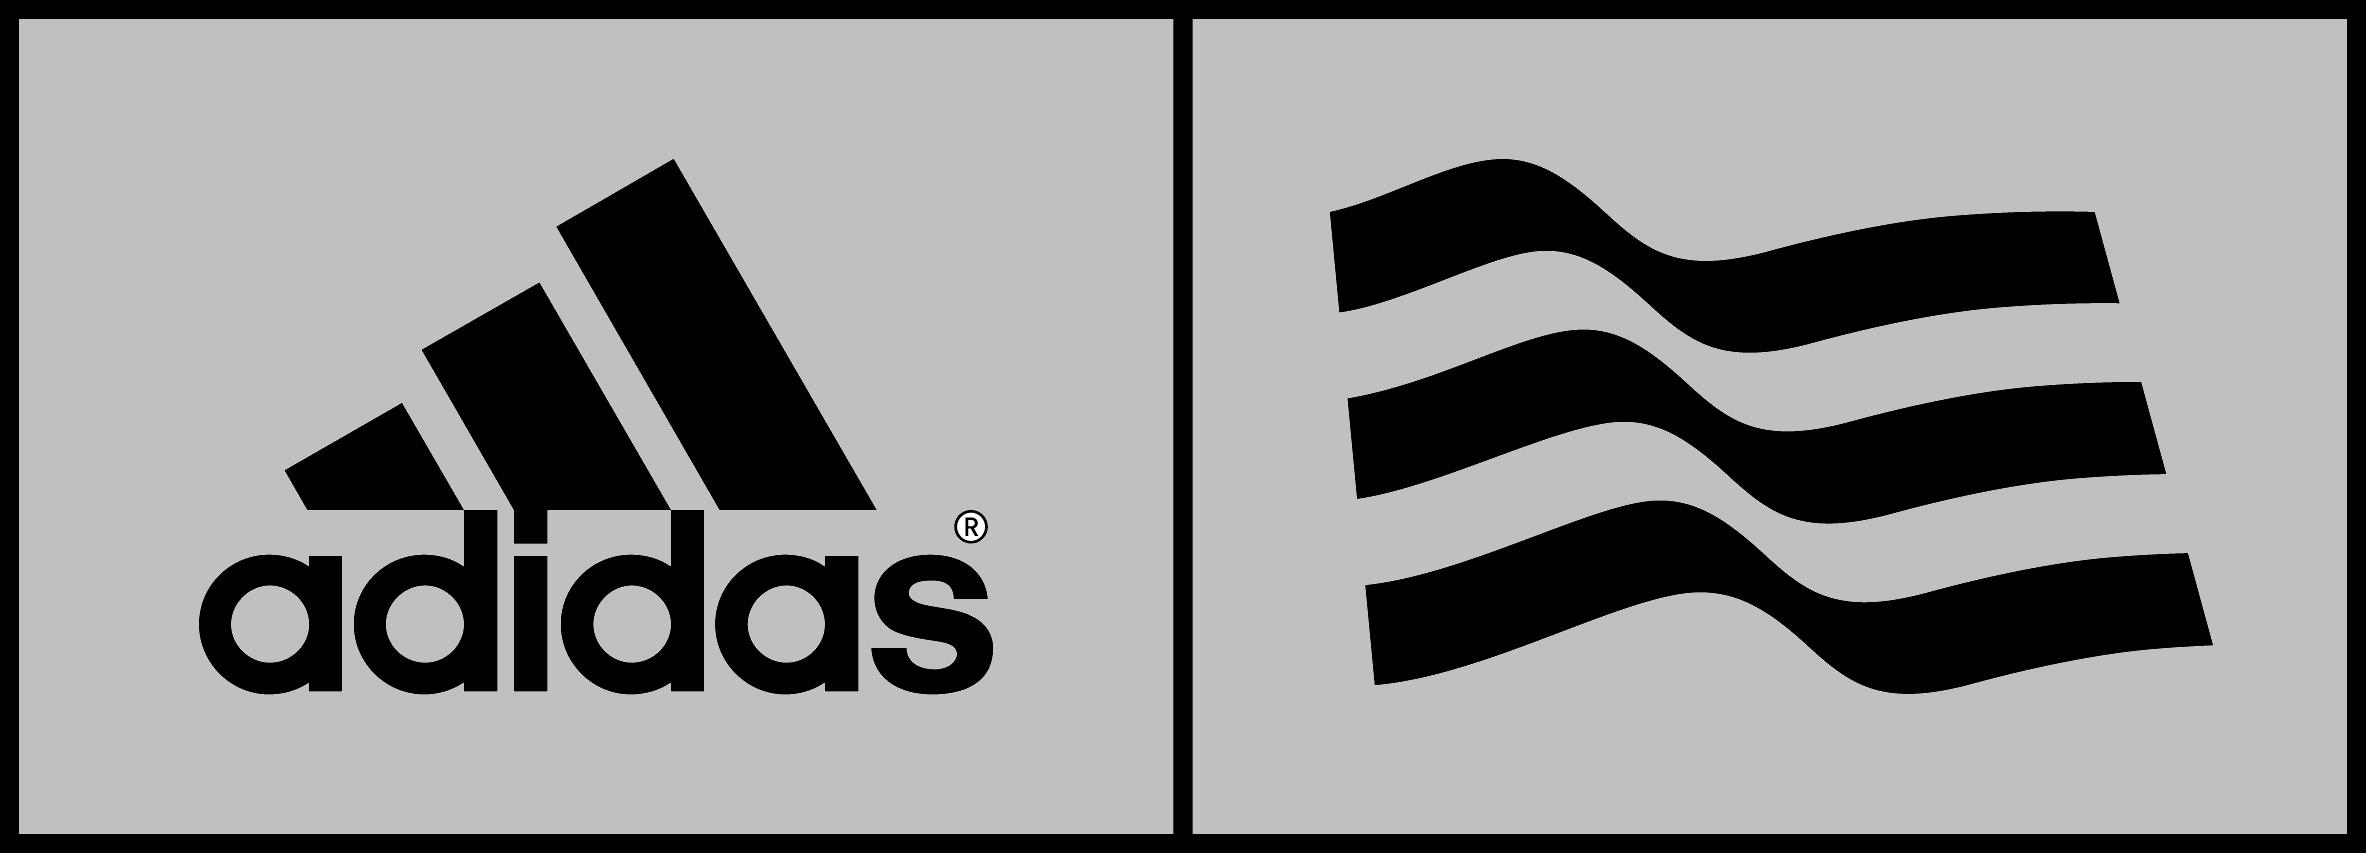 adidas-golf-logo.png